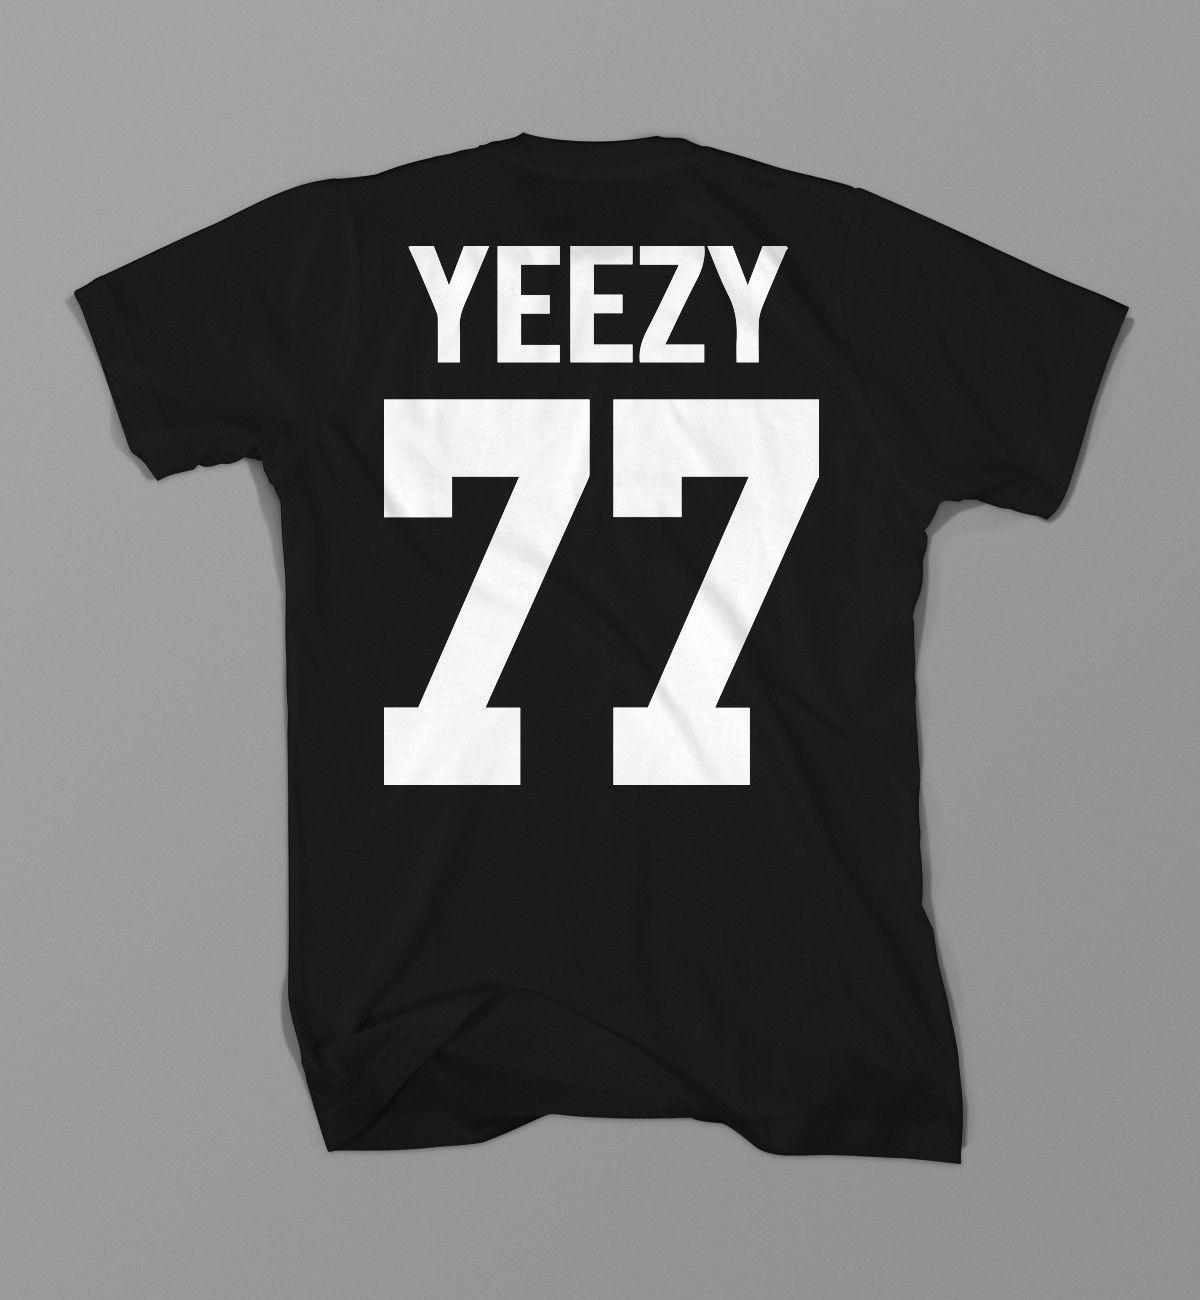 Yeezy Kanye West Yeezus T Shirt